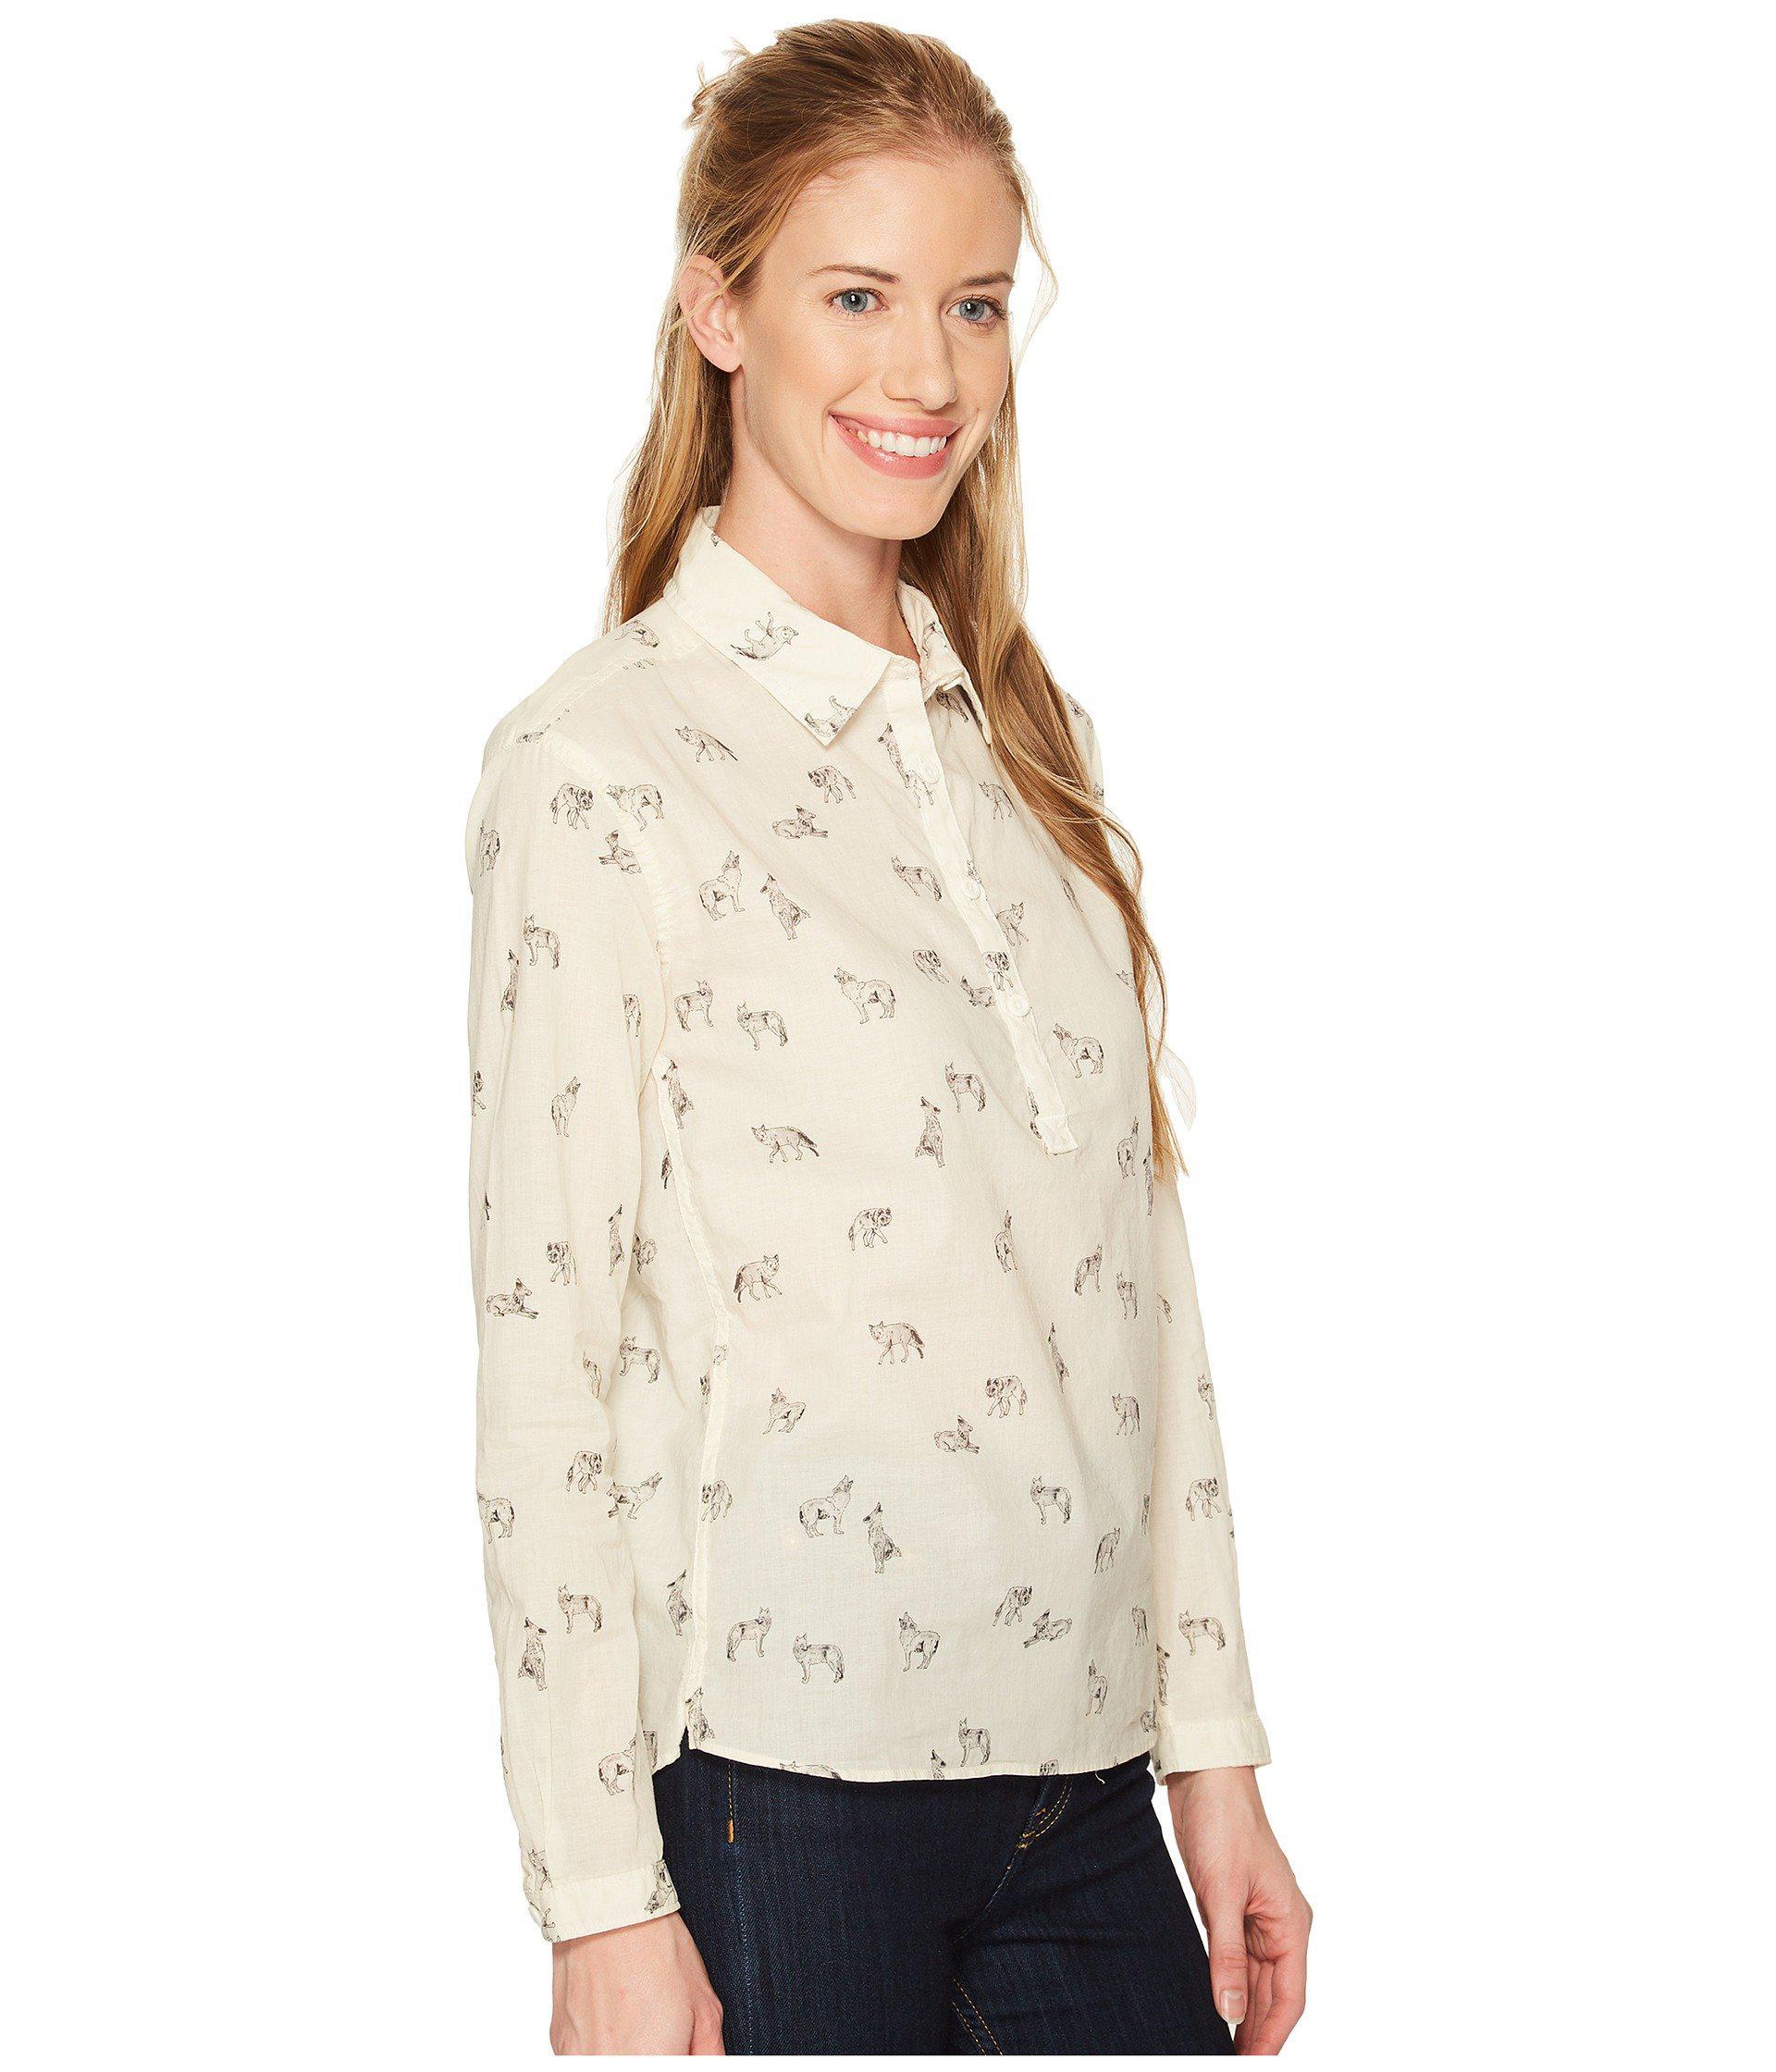 542386ea2 Women's White Barilles Pullover Shirt